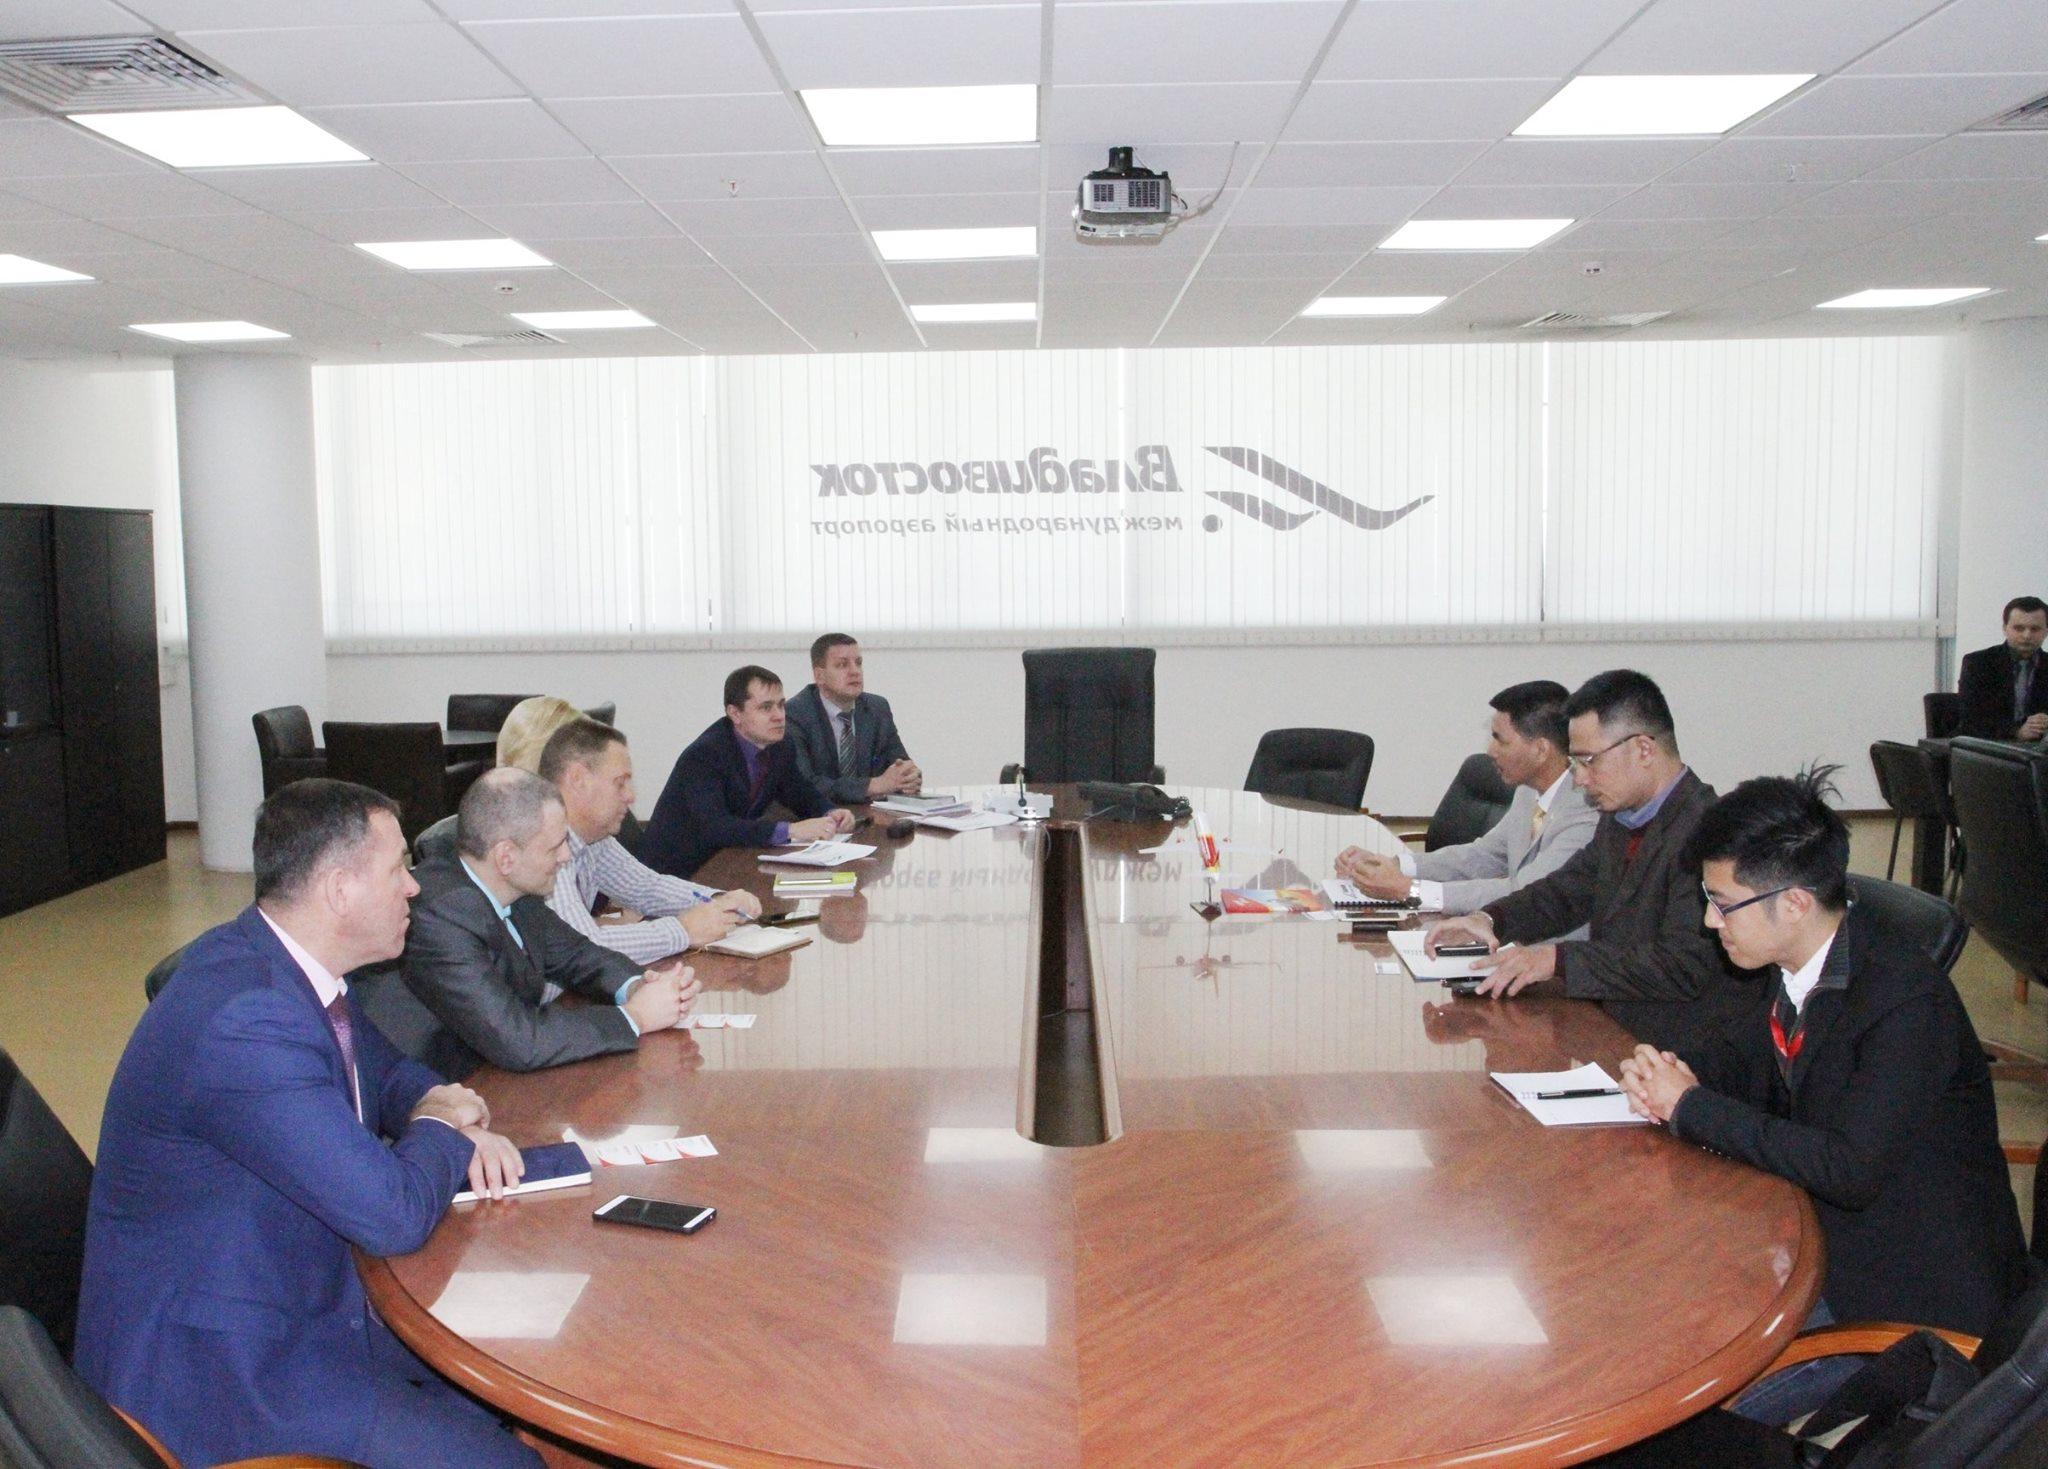 Аэропорт Владивосток провел рабочую встречу с представителями вьетнамской авиакомпании VietJet Air